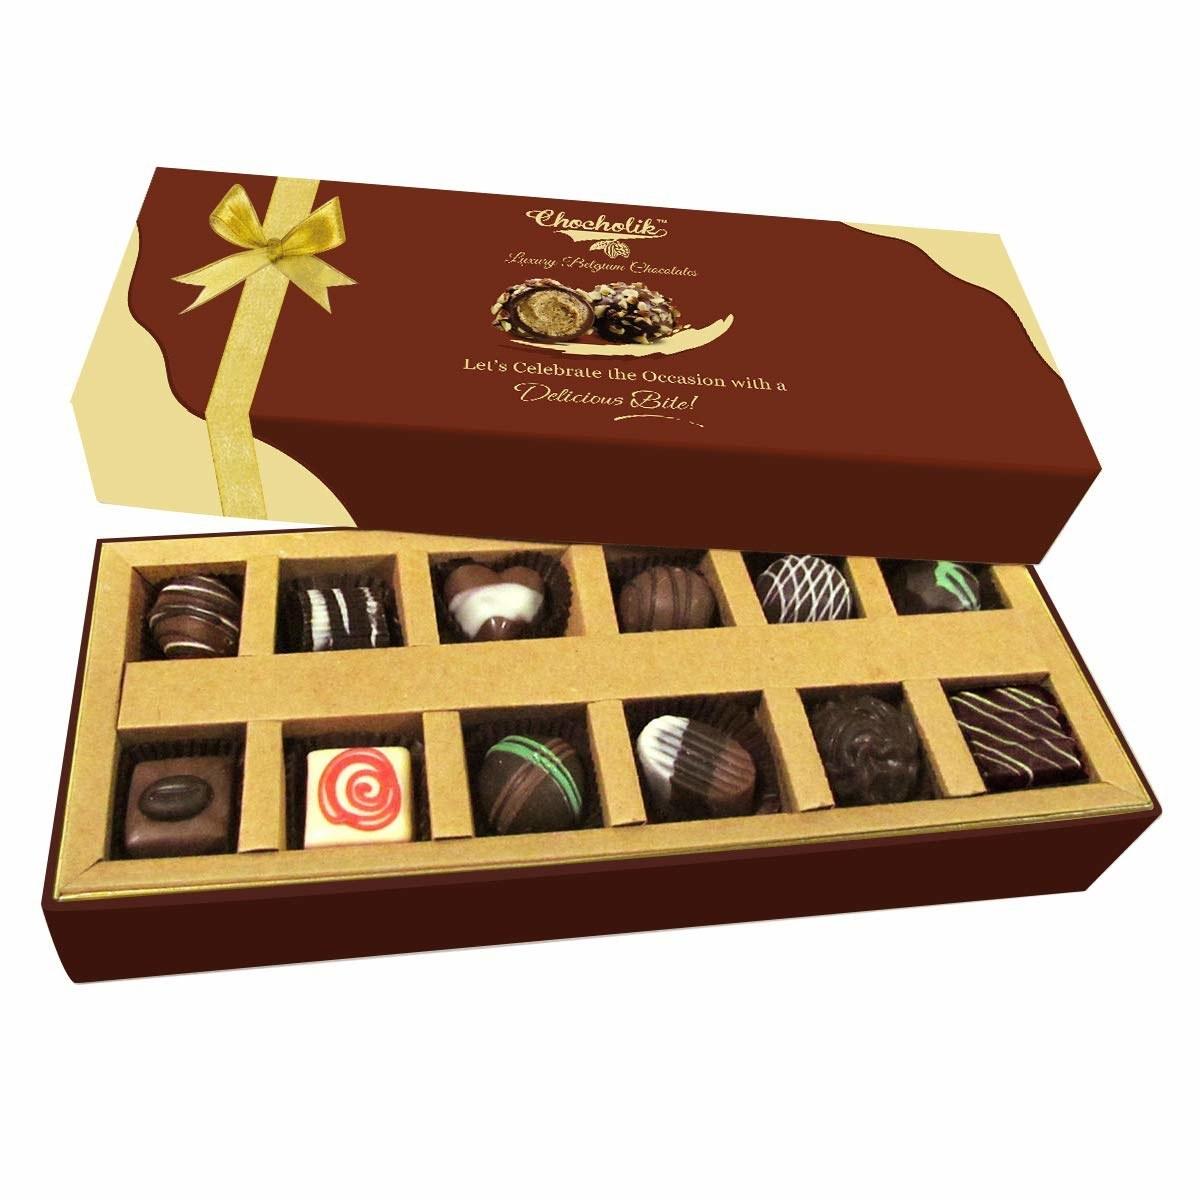 A box of Belgian chocolates